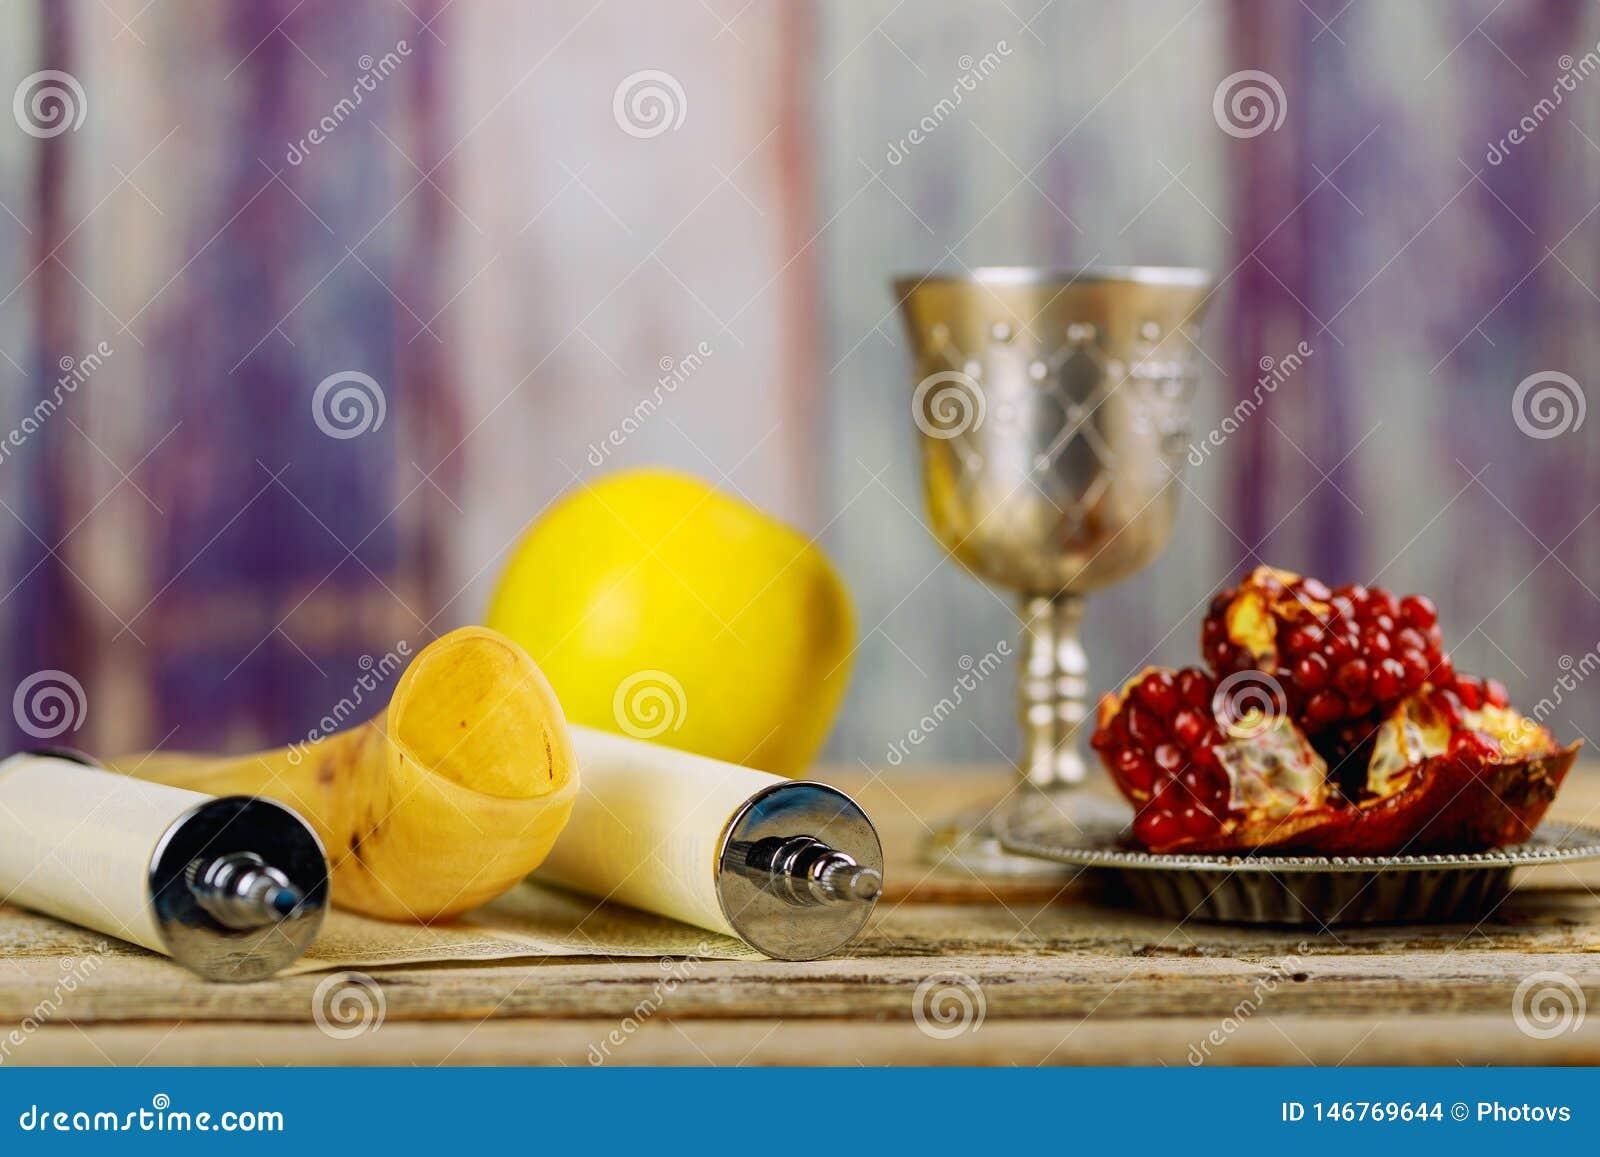 Rosh hashanah犹太新年 传统假日标志-羊角号、石榴和苹果